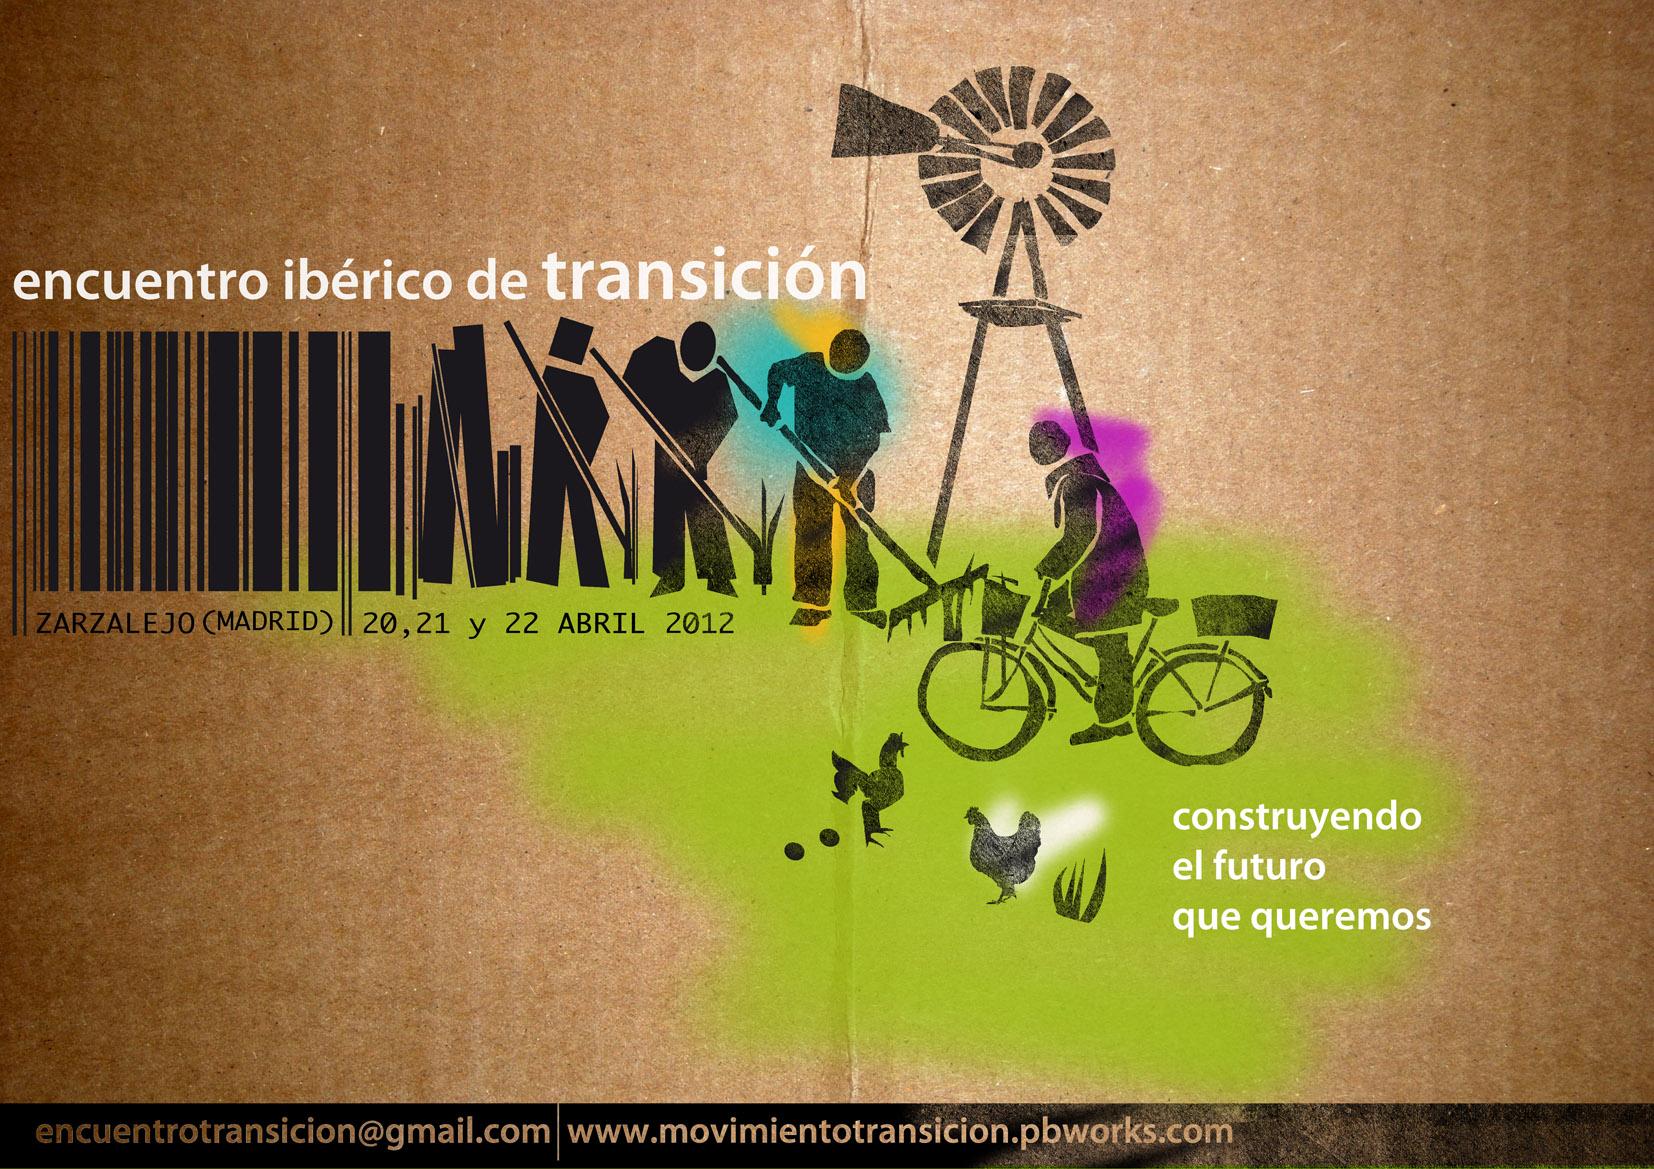 primer encuentro iberico de transicion